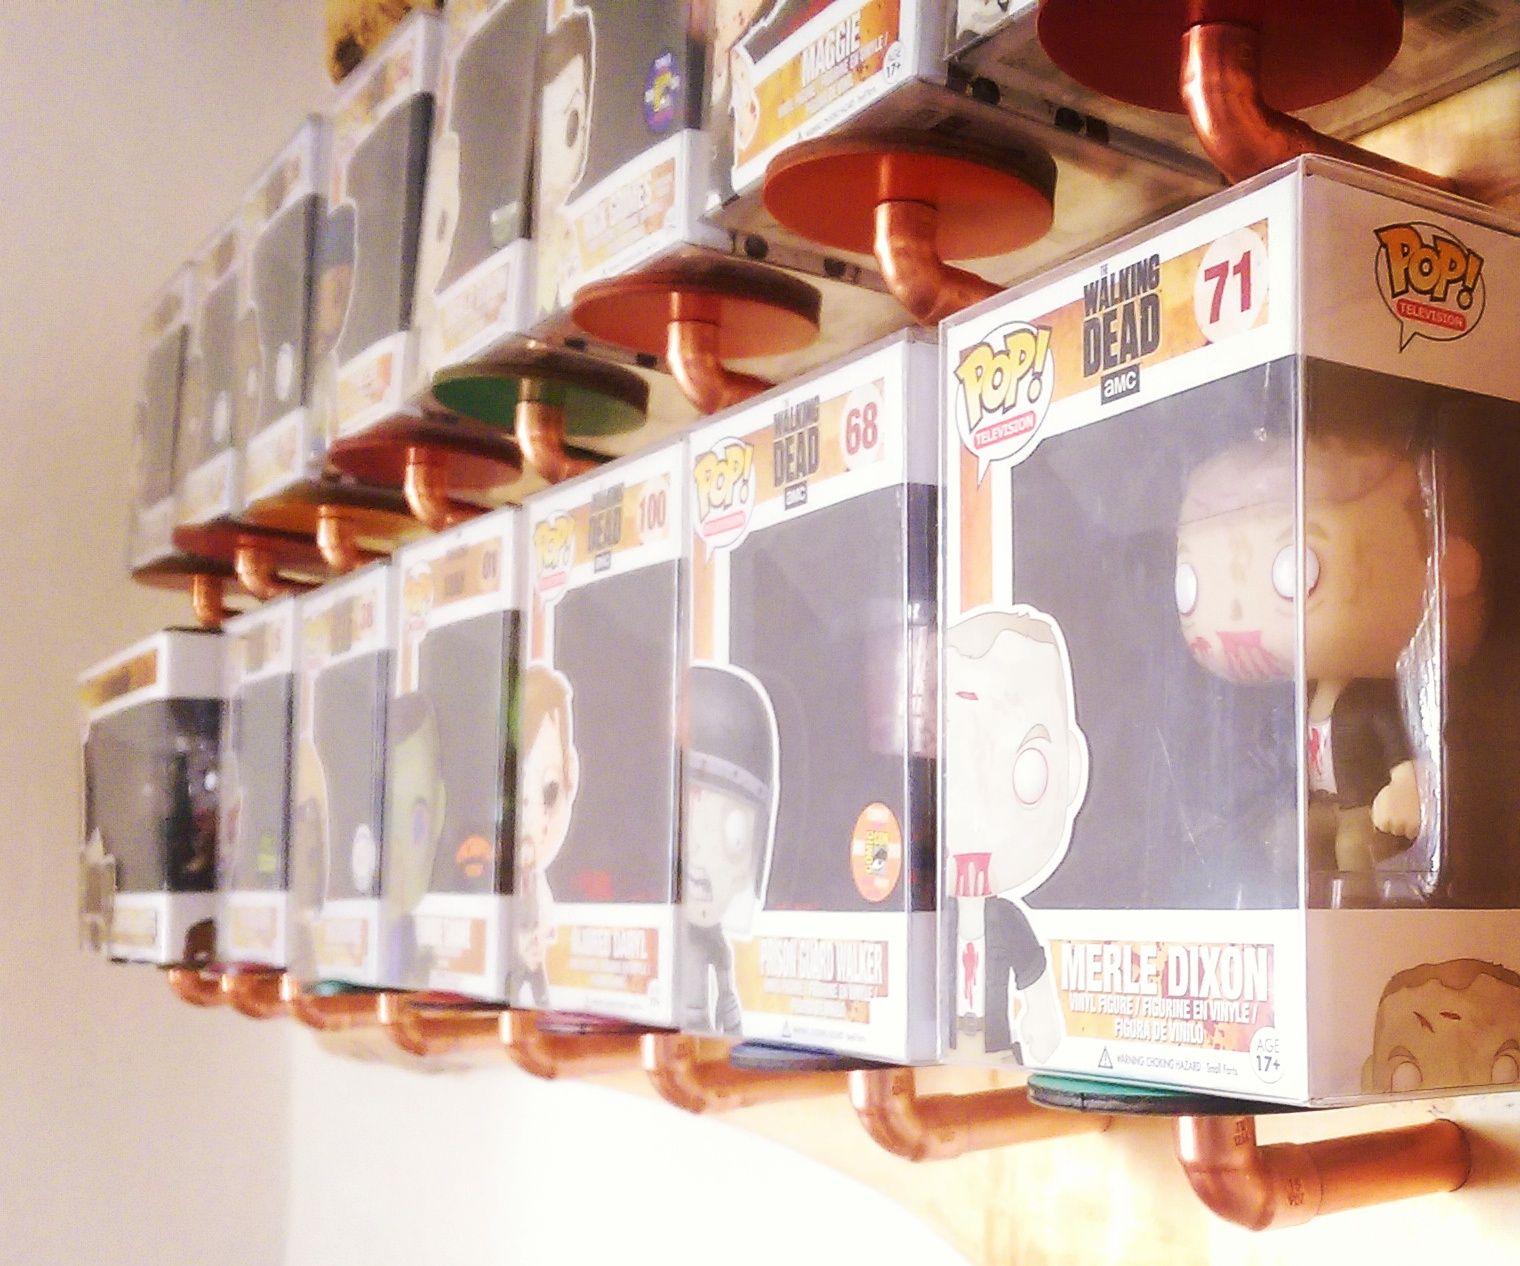 Funko Pop Vinyl Wall Display